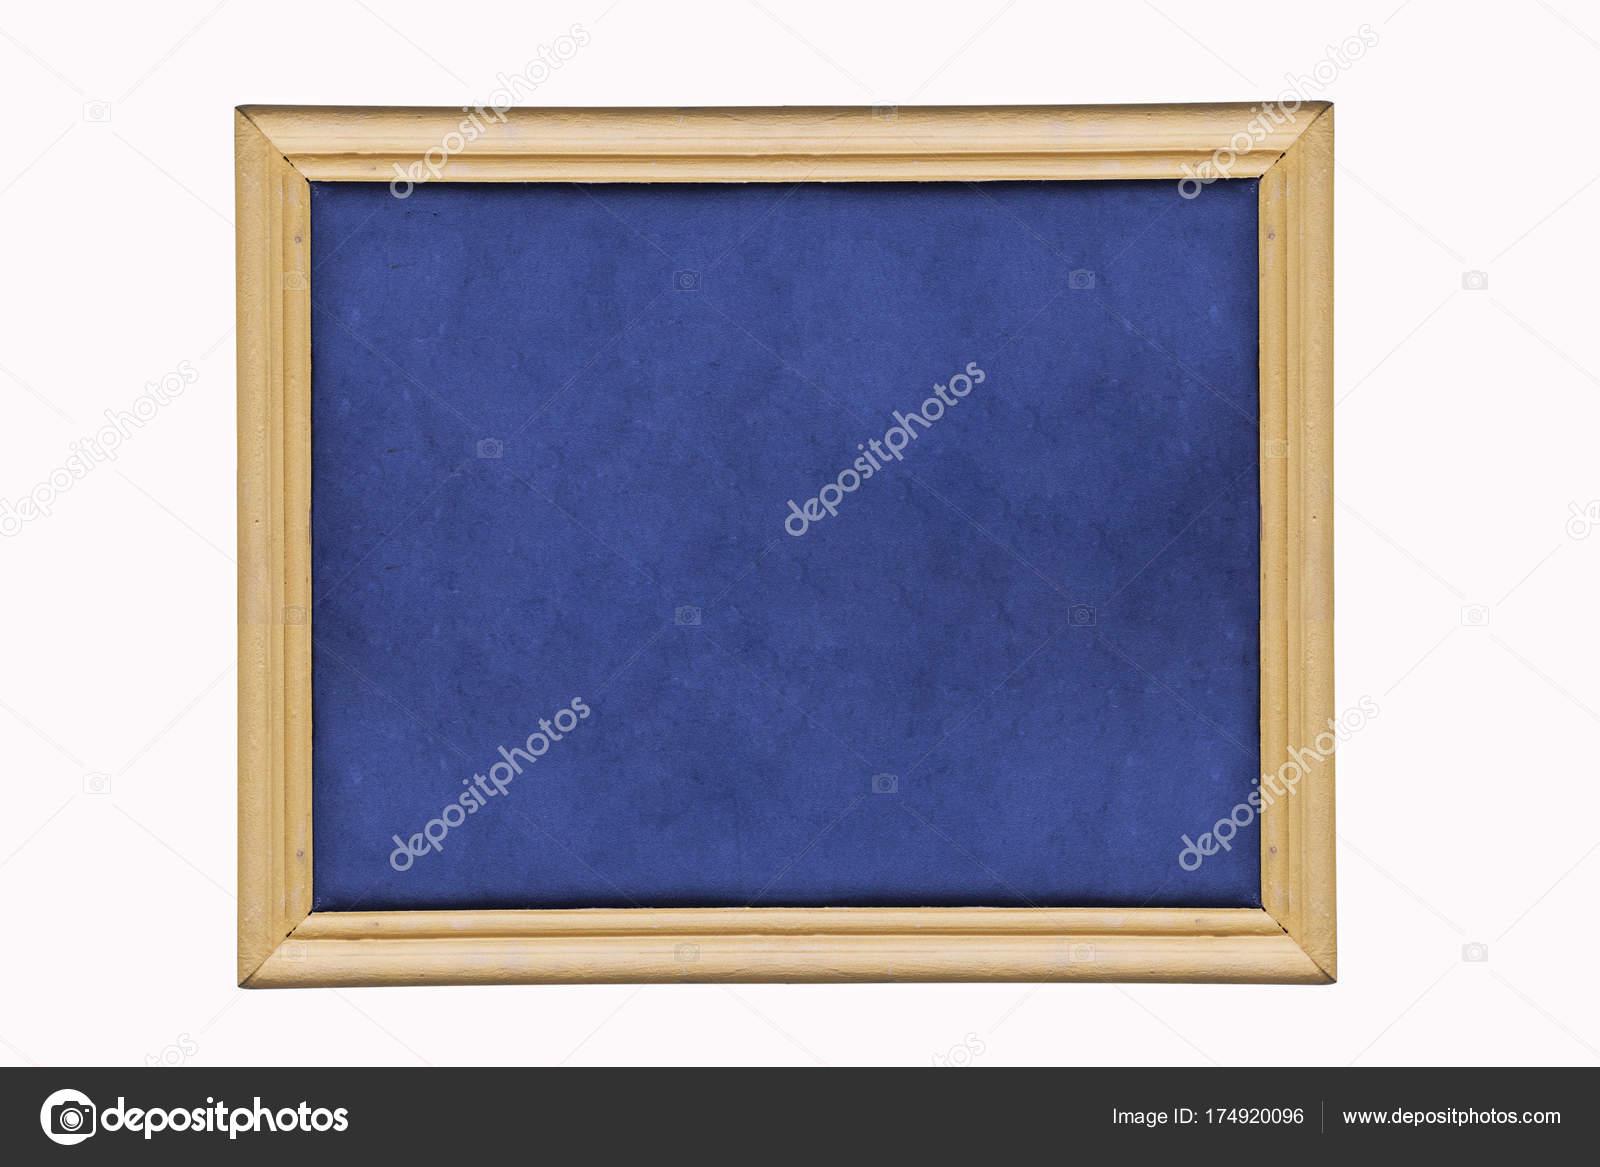 Billboard Und Holz Rahmen Hintergrund — Stockfoto © ngad #174920096